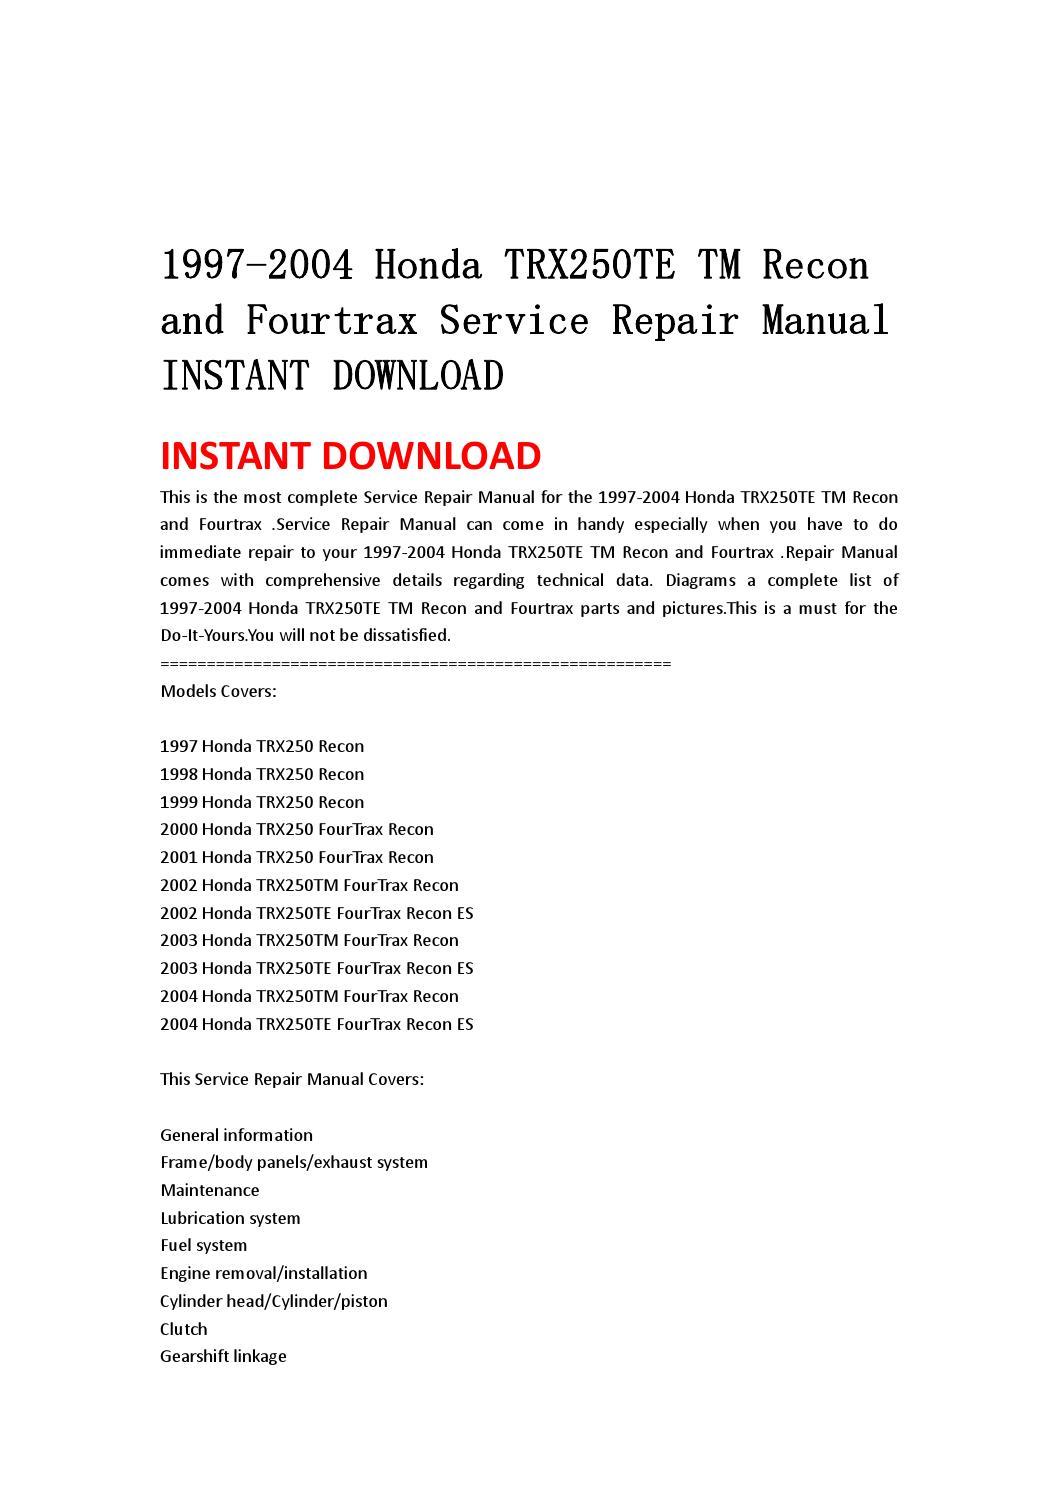 1997 2004 honda trx250te tm recon and fourtrax service repair manual rh issuu com Honda Lawn Mower Service Manuals honda recon service manual download